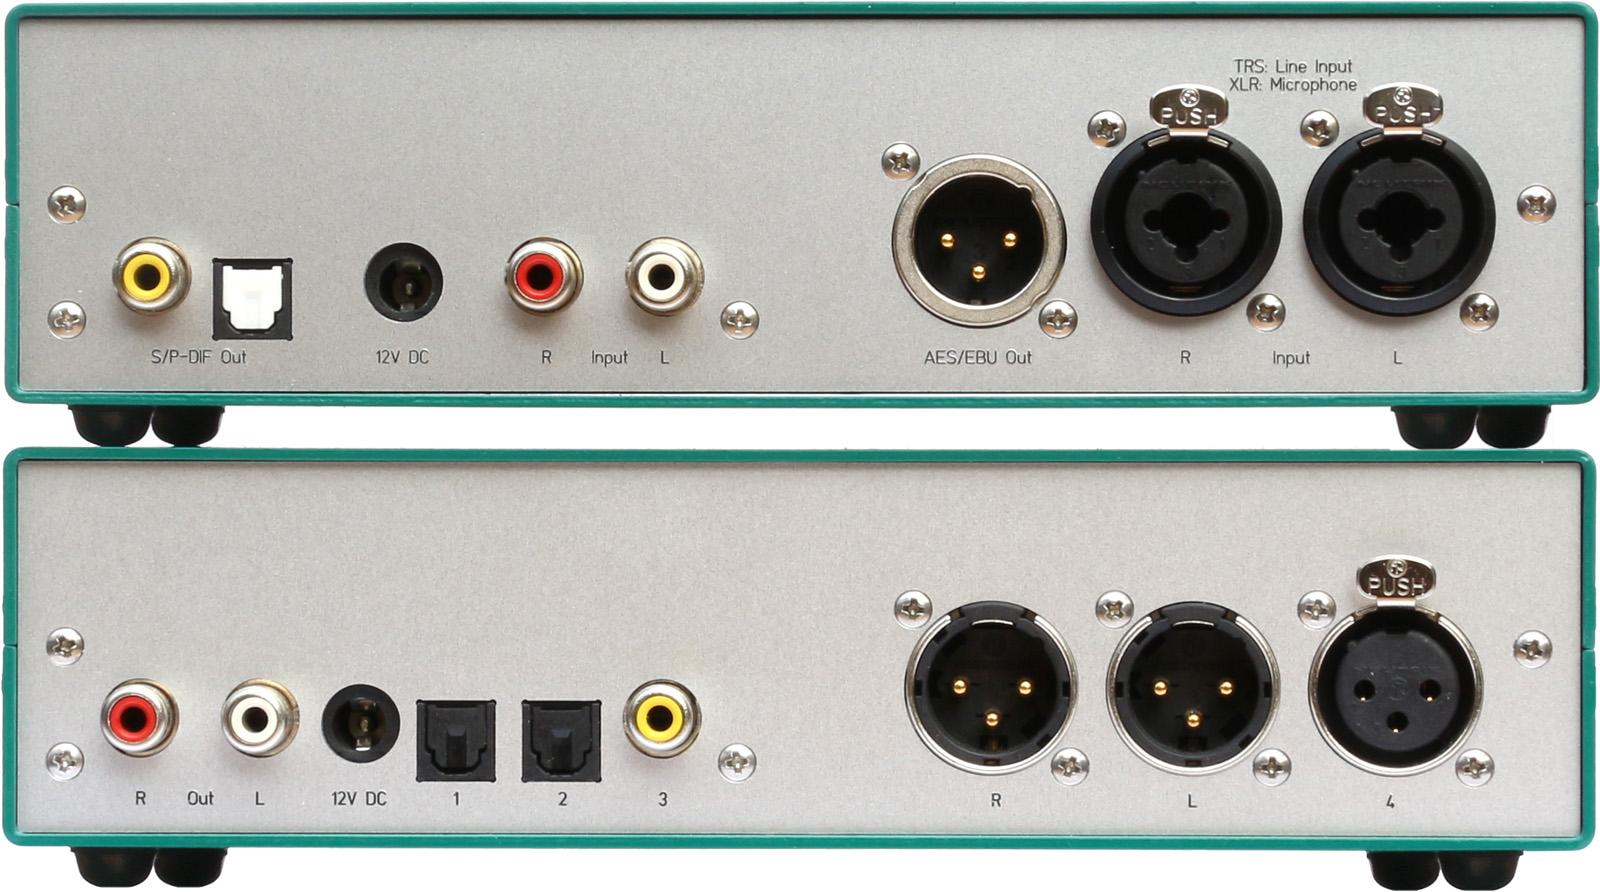 AD24QS - Audio Analog to Digital Converter 24 Bit / 192 kHz